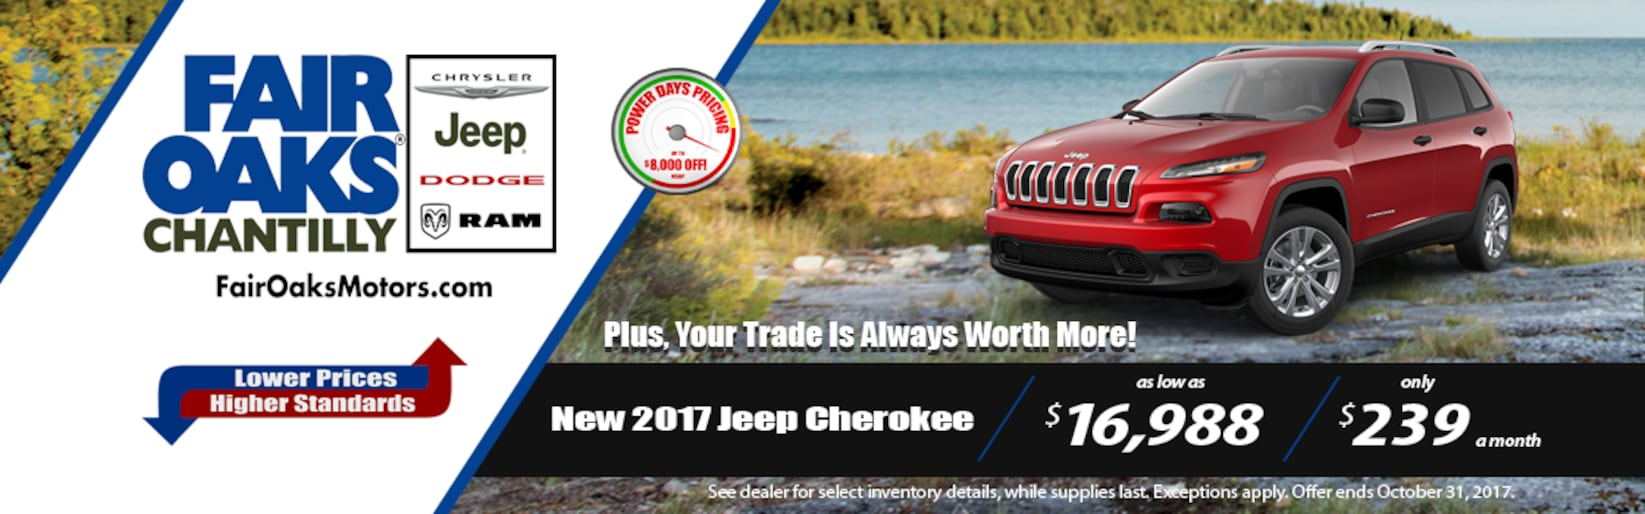 Fair oaks chantilly chrysler jeep dodge ram new used for Fair oaks motors jeep